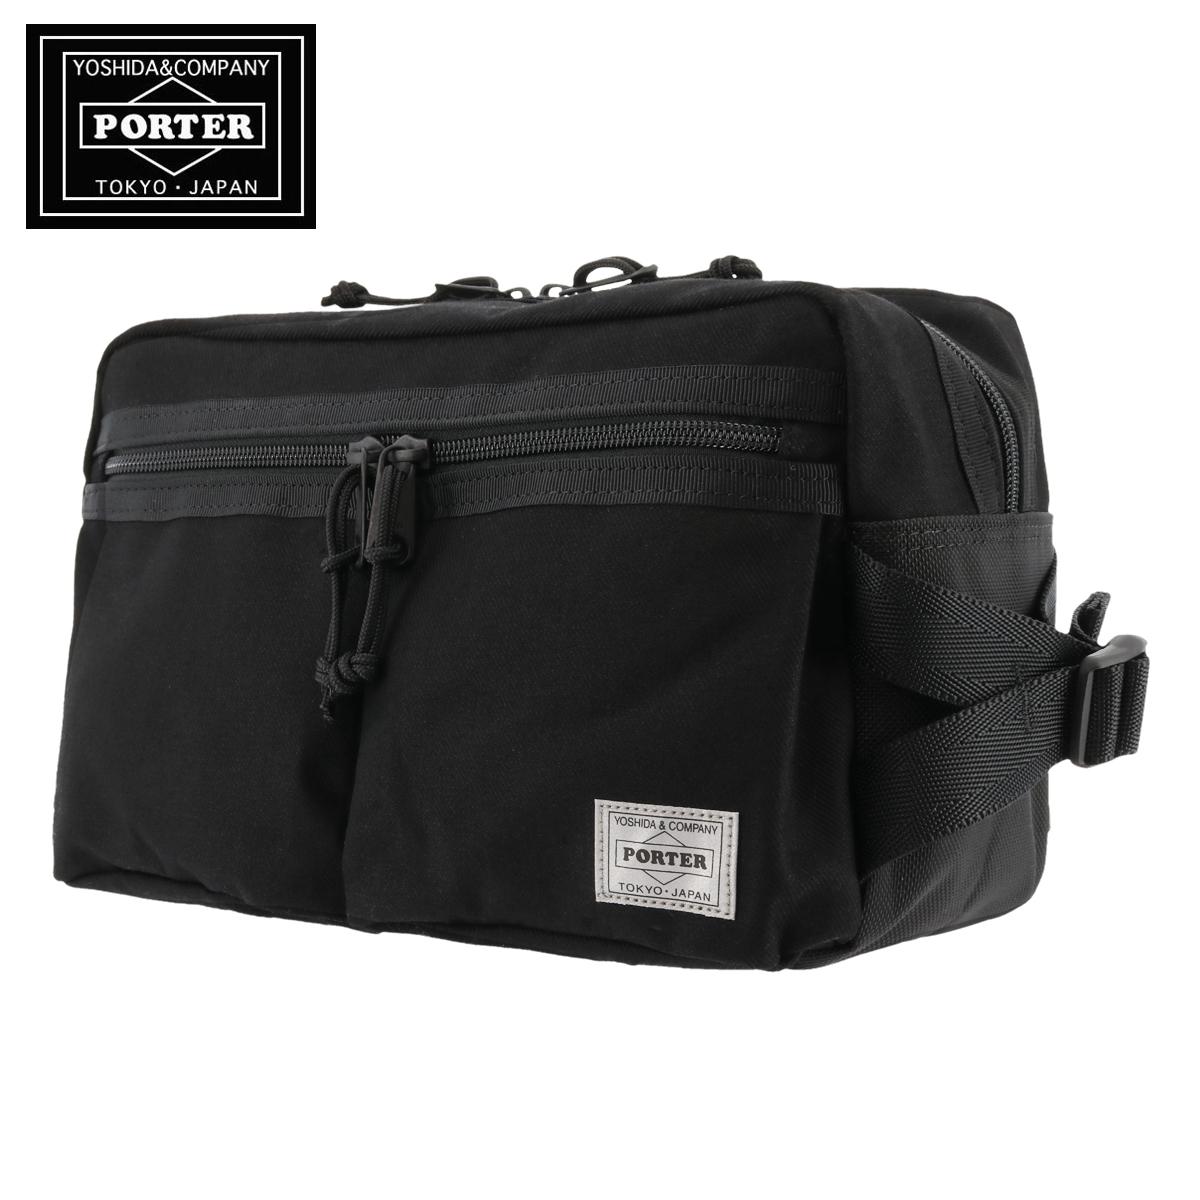 Used Yoshida Porter 622-08302 Tanker Waist Bag L Black F//S from Japan